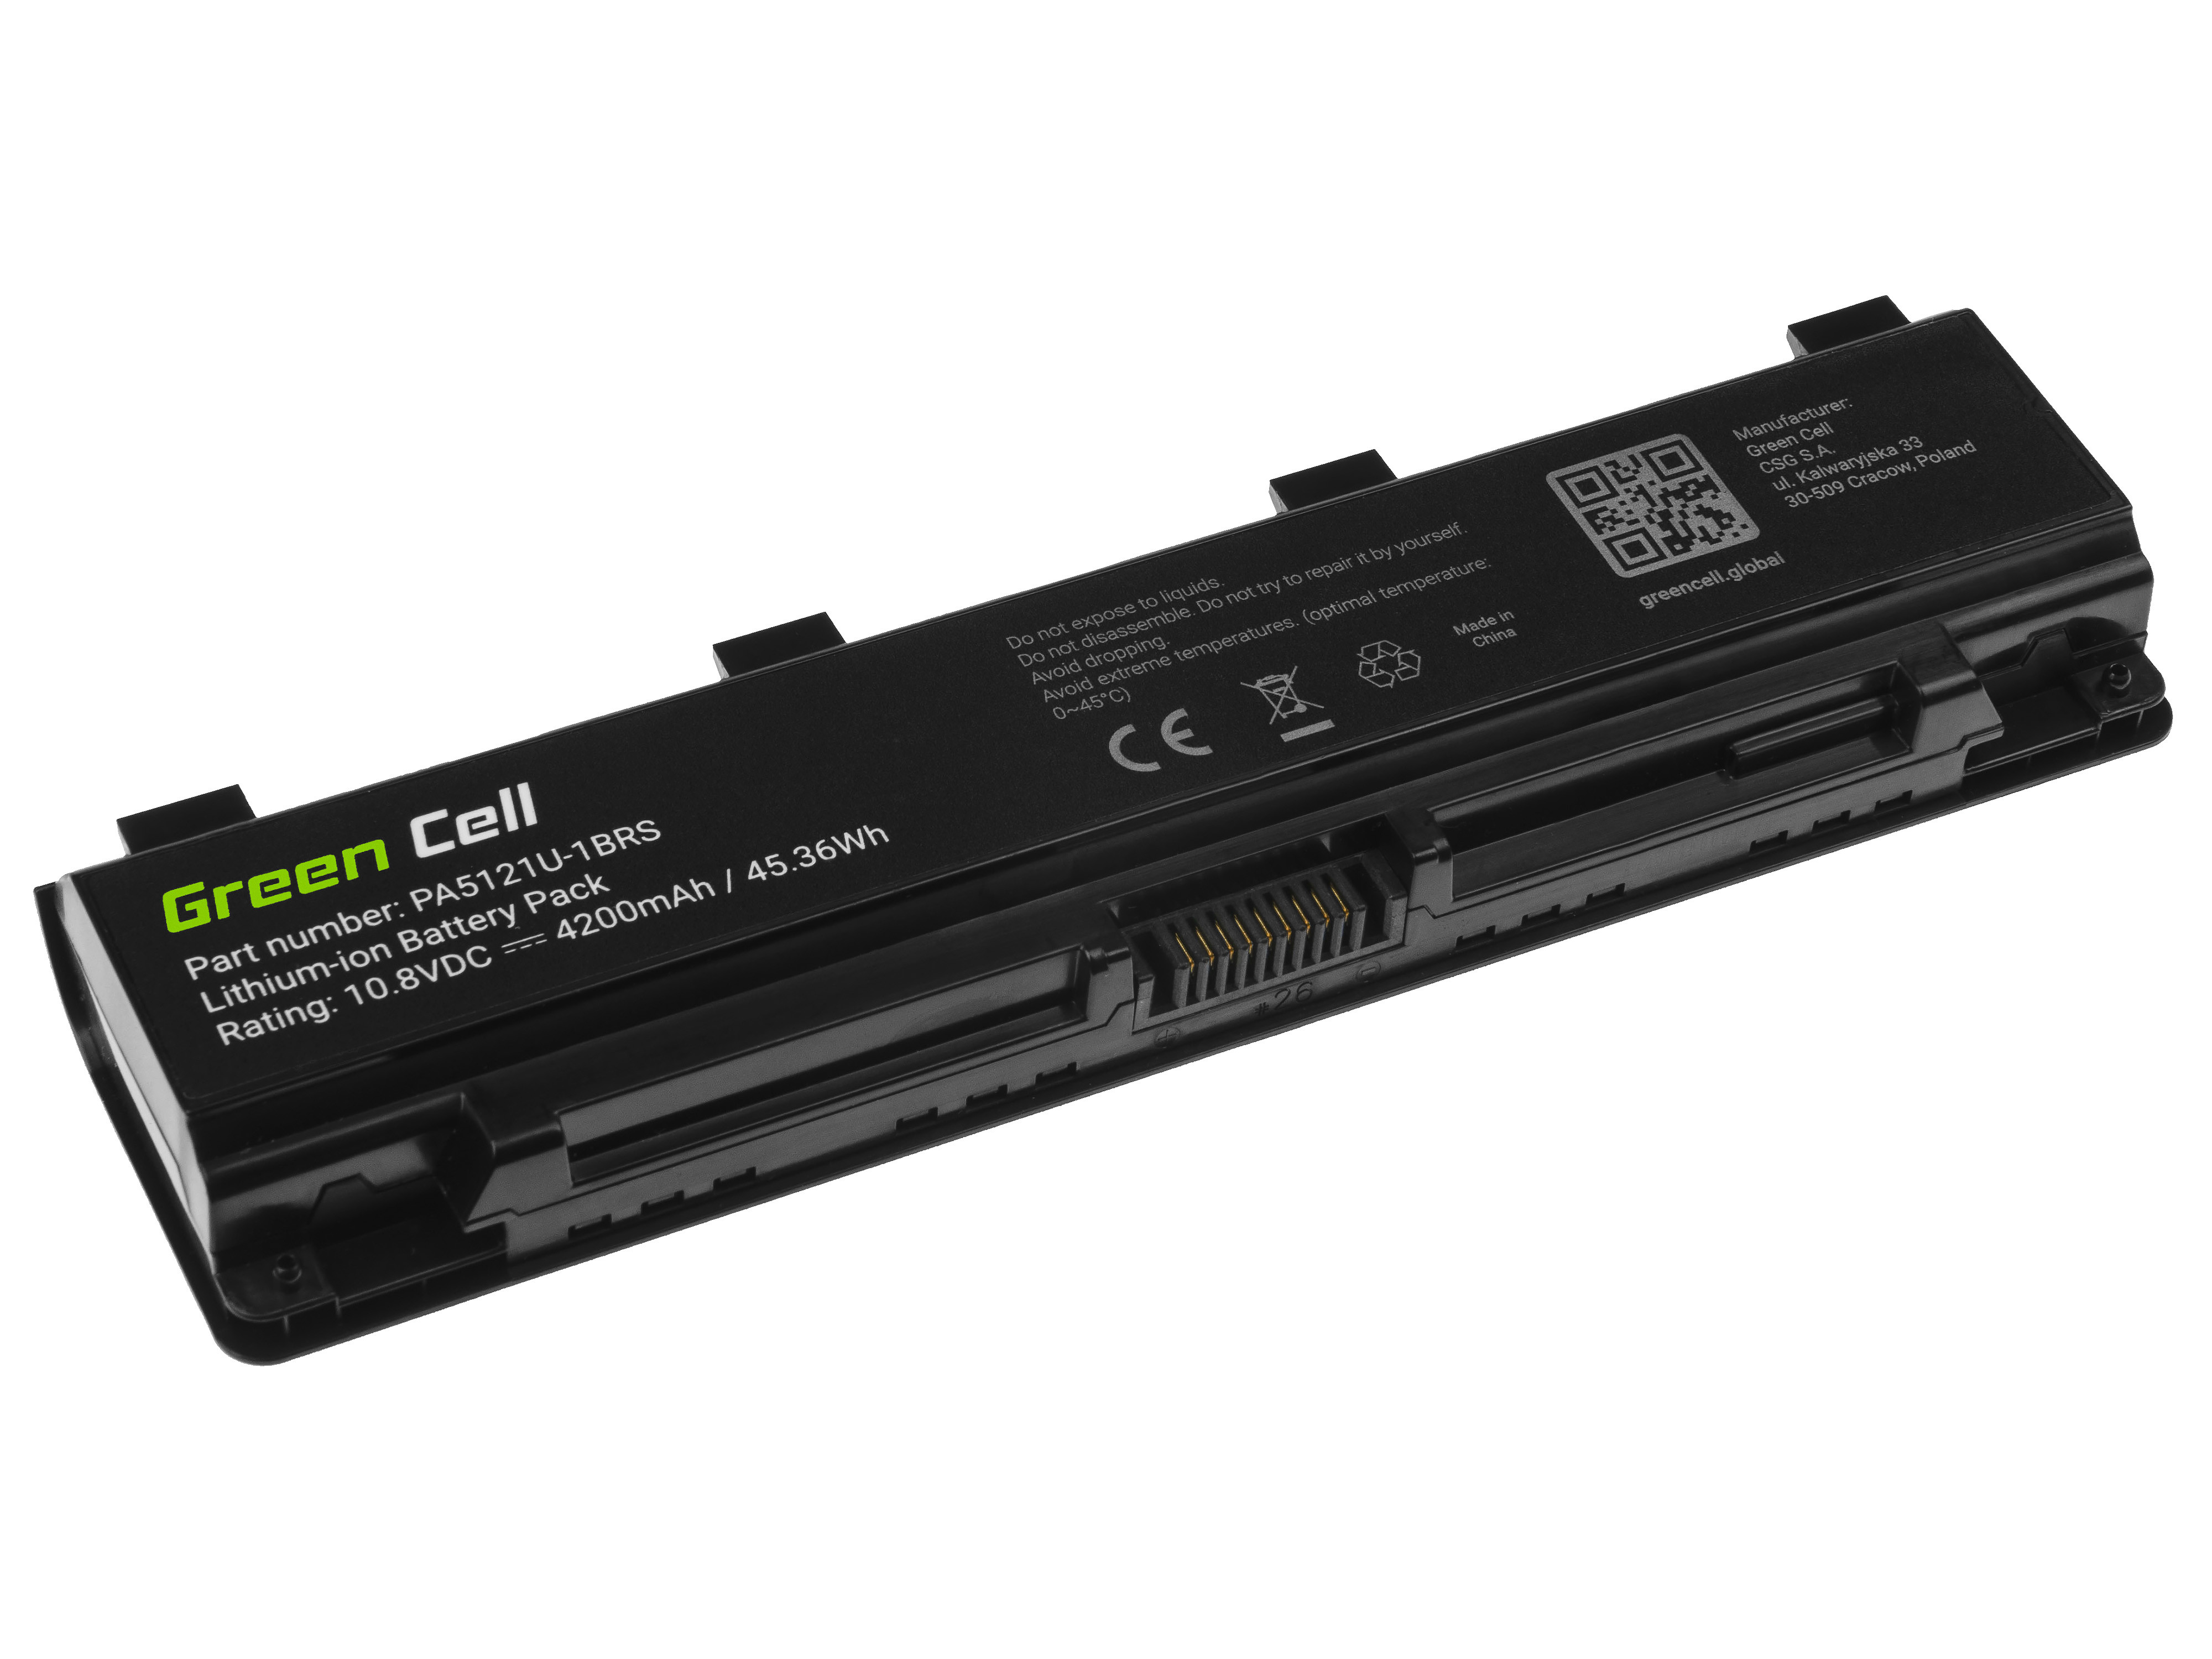 Green Cell TS65 Baterie Toshiba PA5121U-1BRS PABAS274, Toshiba Satellite P70-A P70-A-10L P70-A-10W P75-A P75-A7100 P75-A7200 4200mAh Li-Ion – neoriginální